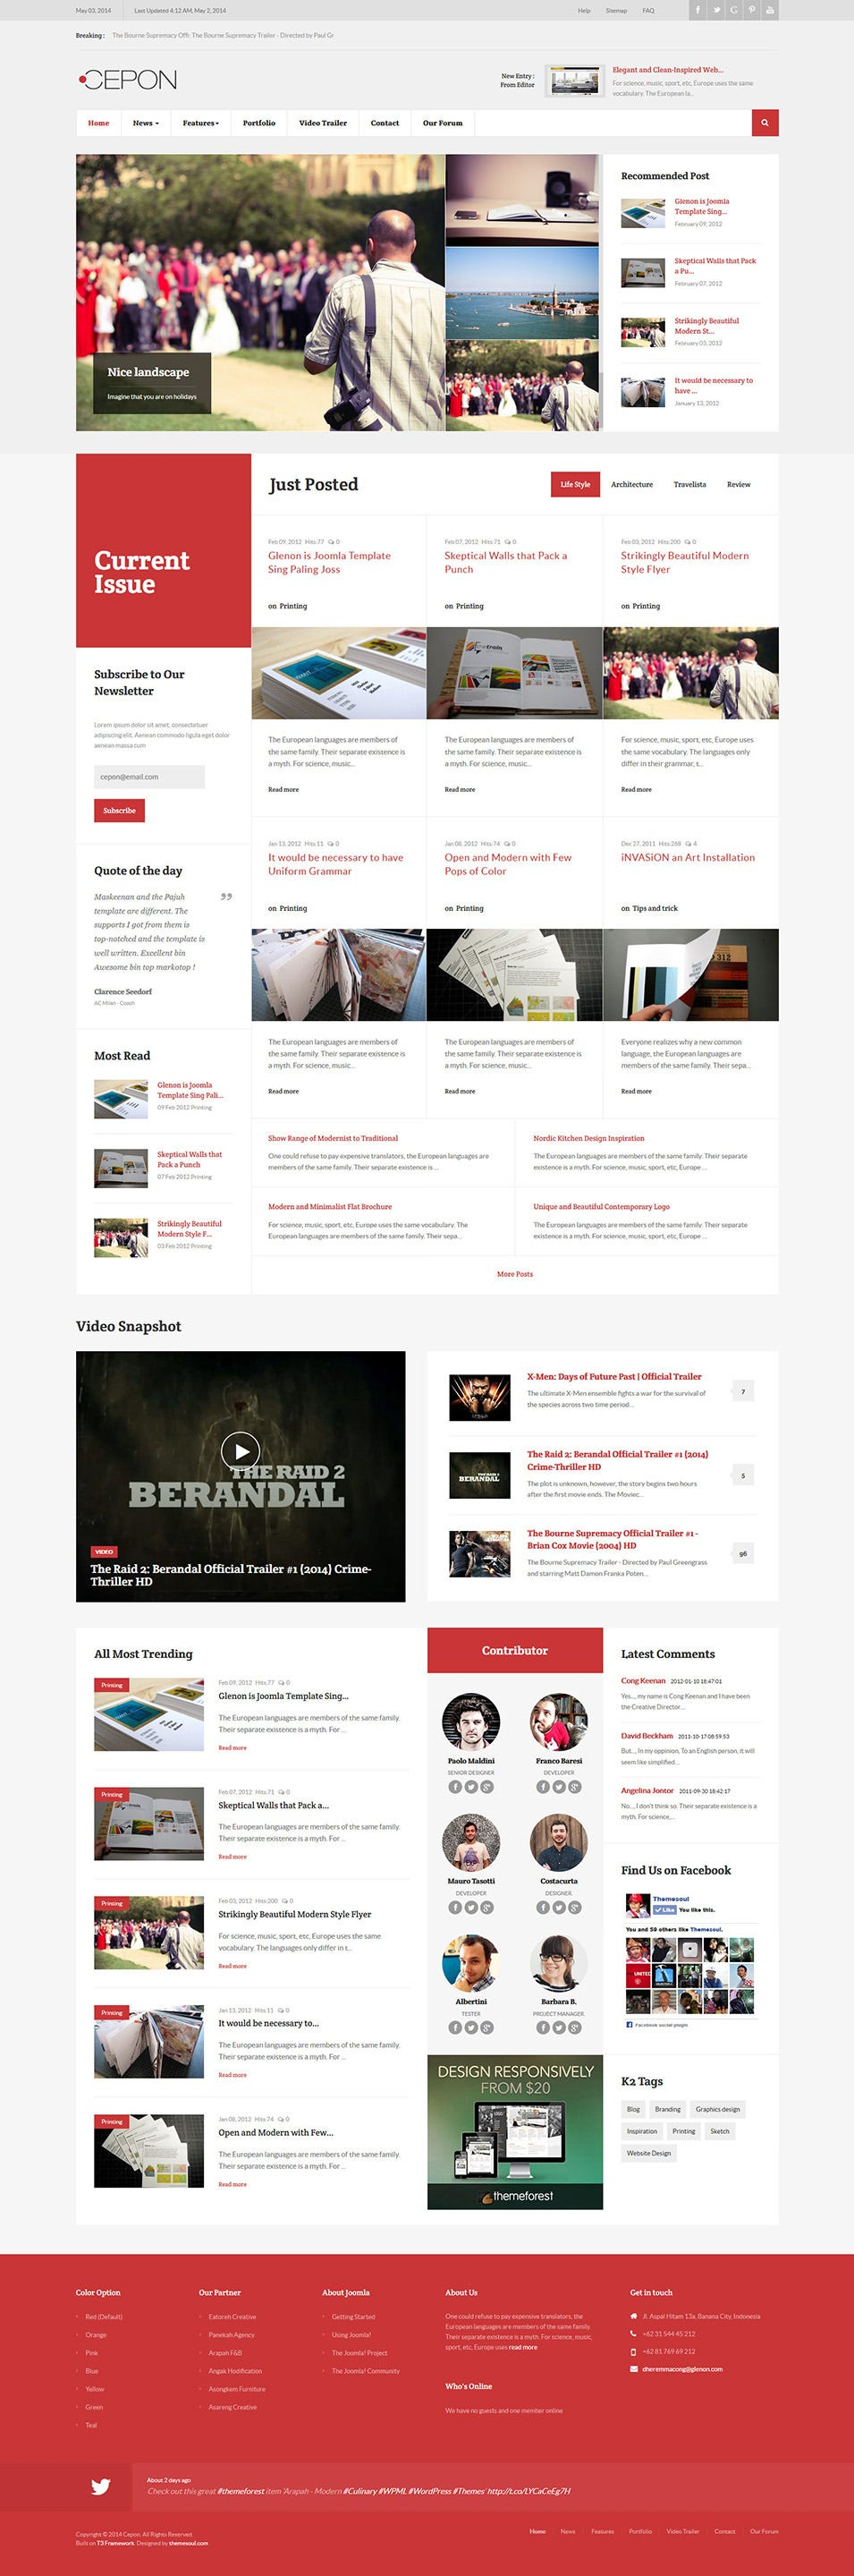 35 free and premium magazine website templates free premium templates. Black Bedroom Furniture Sets. Home Design Ideas